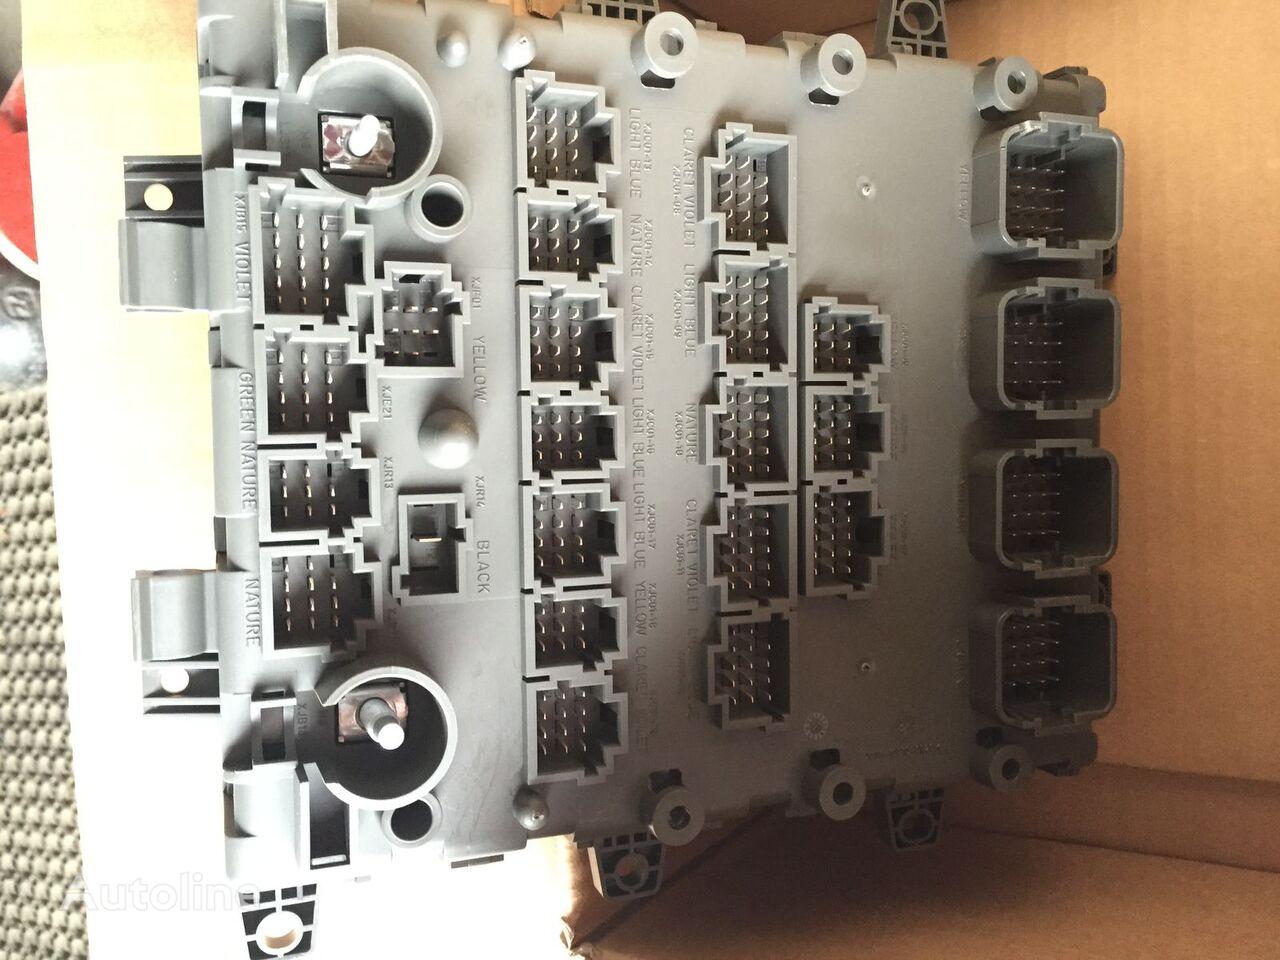 Volvo Fh 480 Fuse Box Auto Electrical Wiring Diagram Fh12 Sicherungsbelegung U2013 Bild Idee